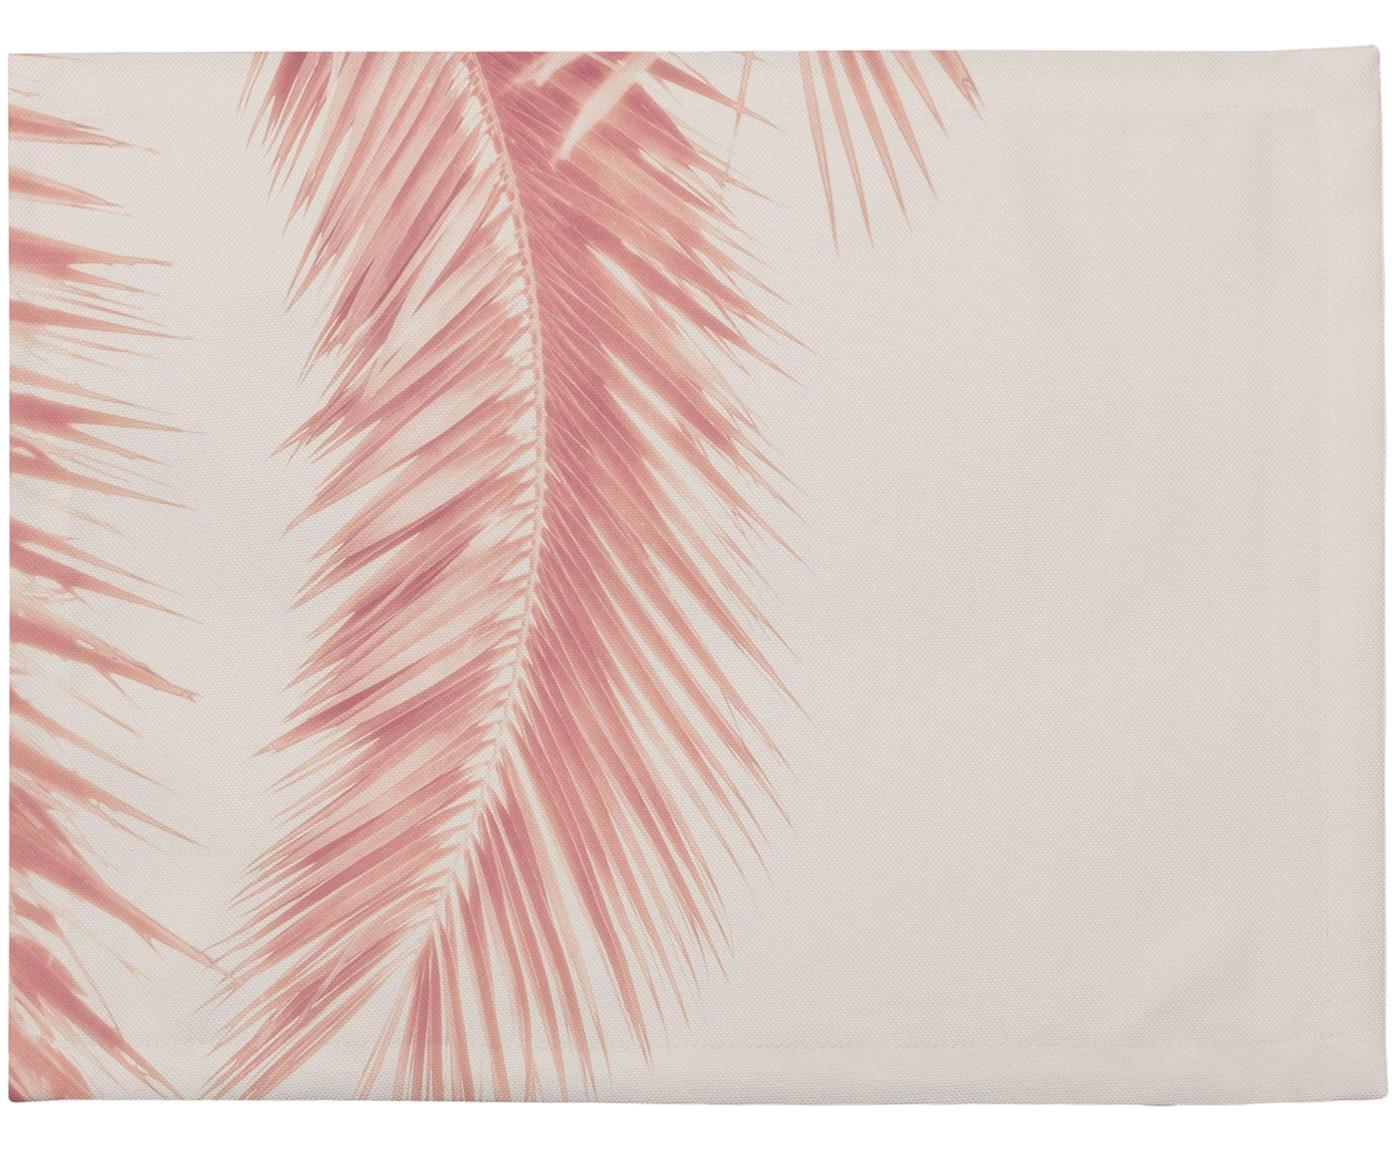 Placemats Palm Leaves, 4 stuks, Polyester, Rozetinten, 35 x 45 cm